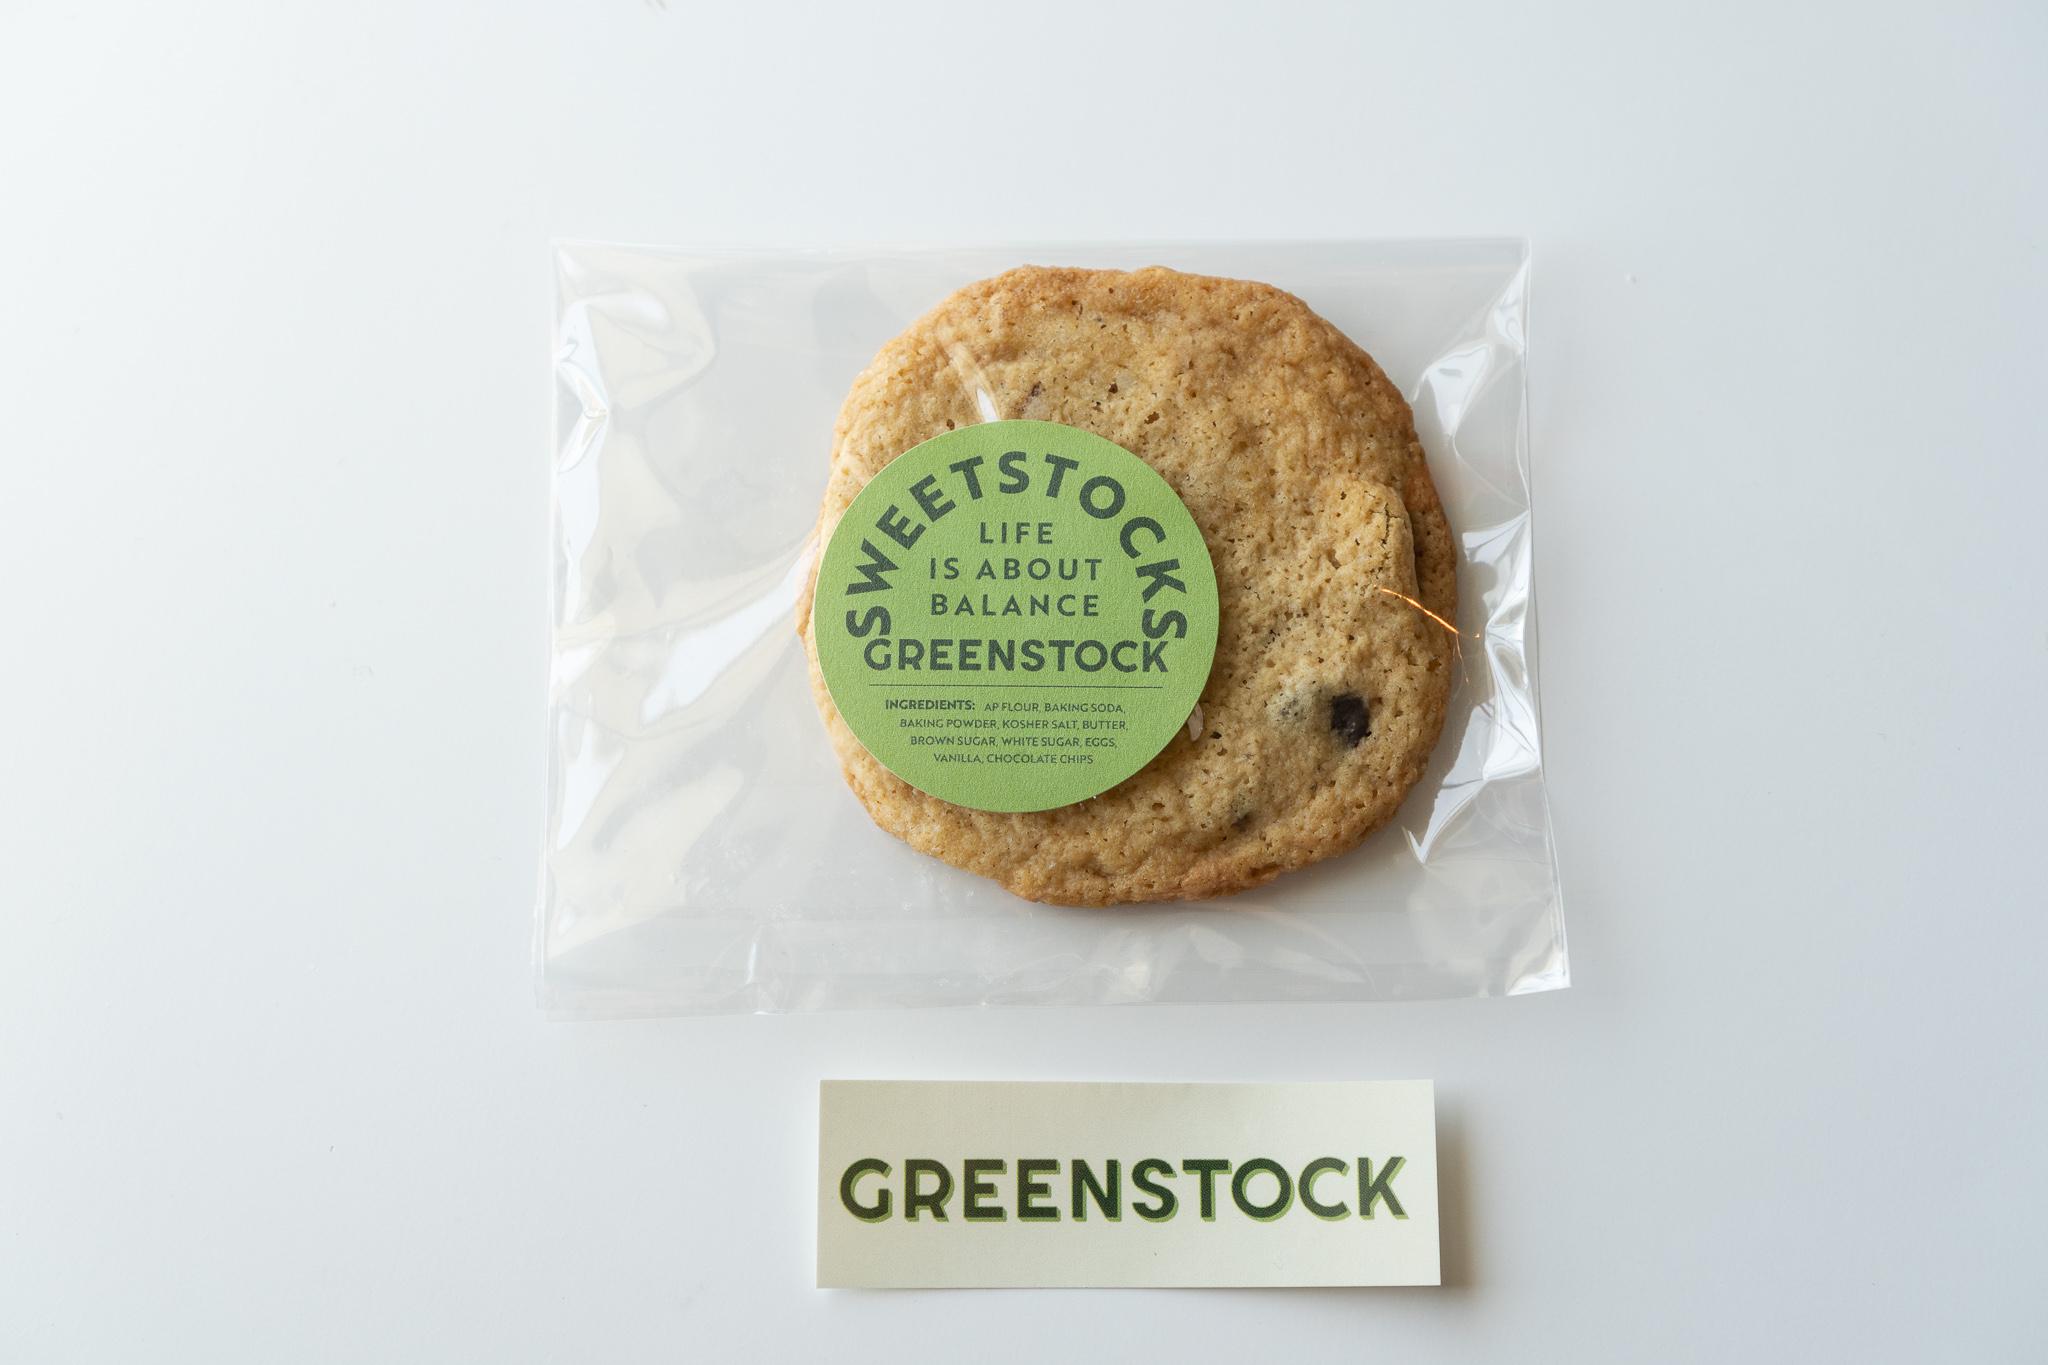 Greenstock Freshly Baked Chocolate Chip Cookie